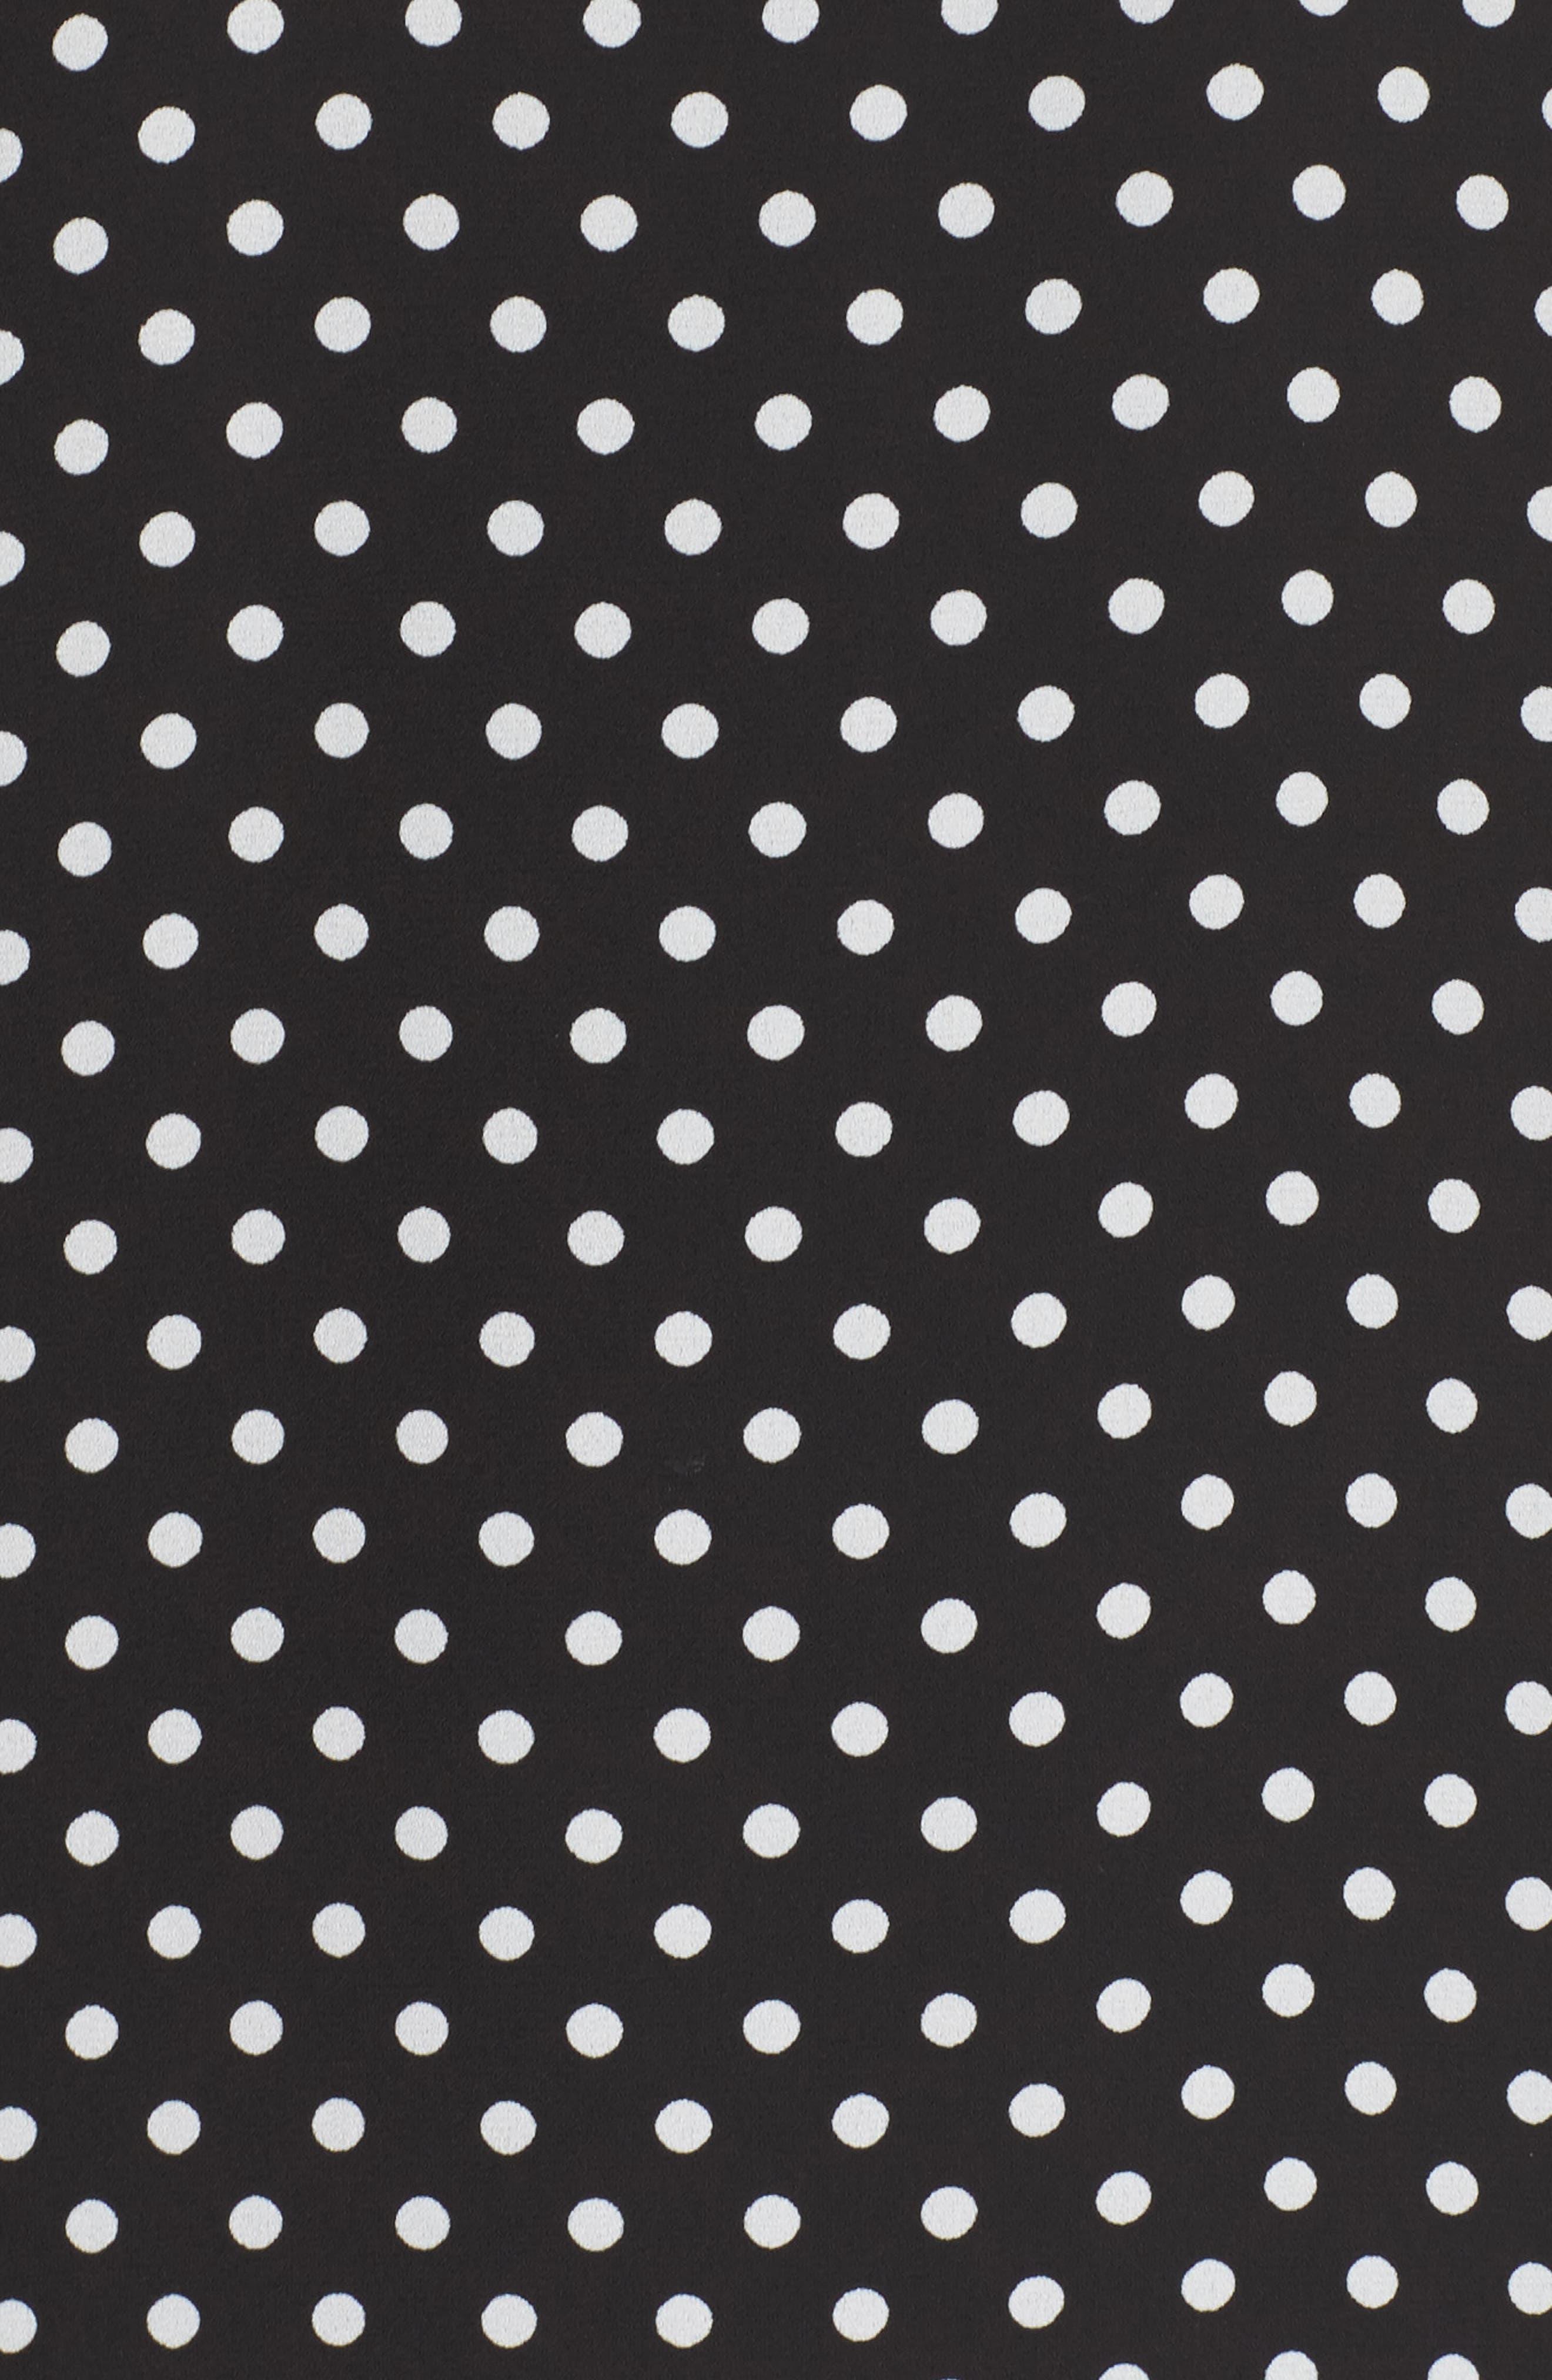 Polka Dot Off the Shoulder Minidress,                             Alternate thumbnail 5, color,                             Black/ White